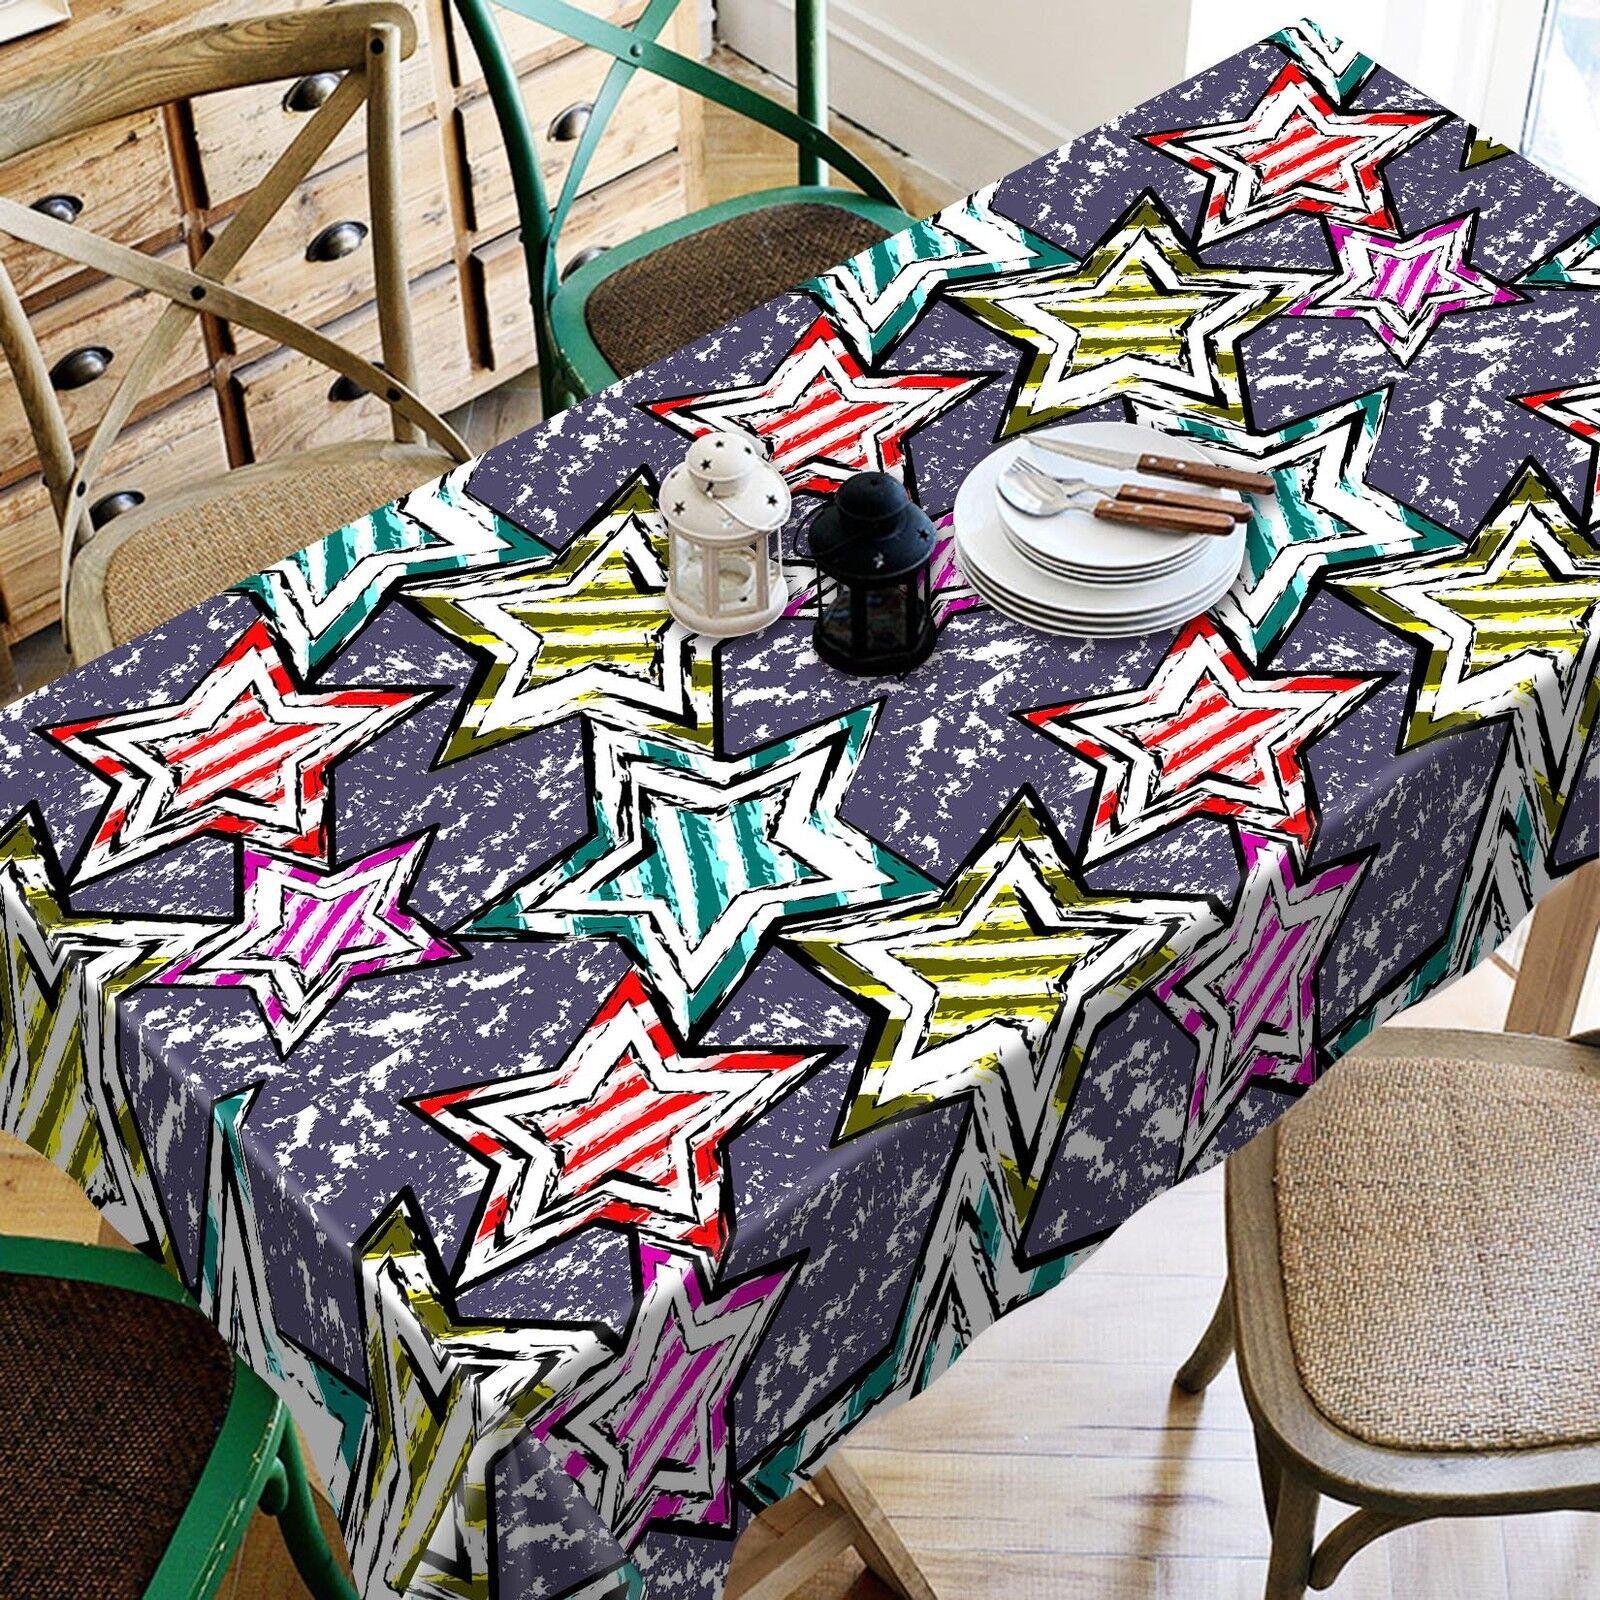 Estrella 3d 47 mantel mantel pañuelo fiesta de cumpleaños AJ wallpaper de Lemon